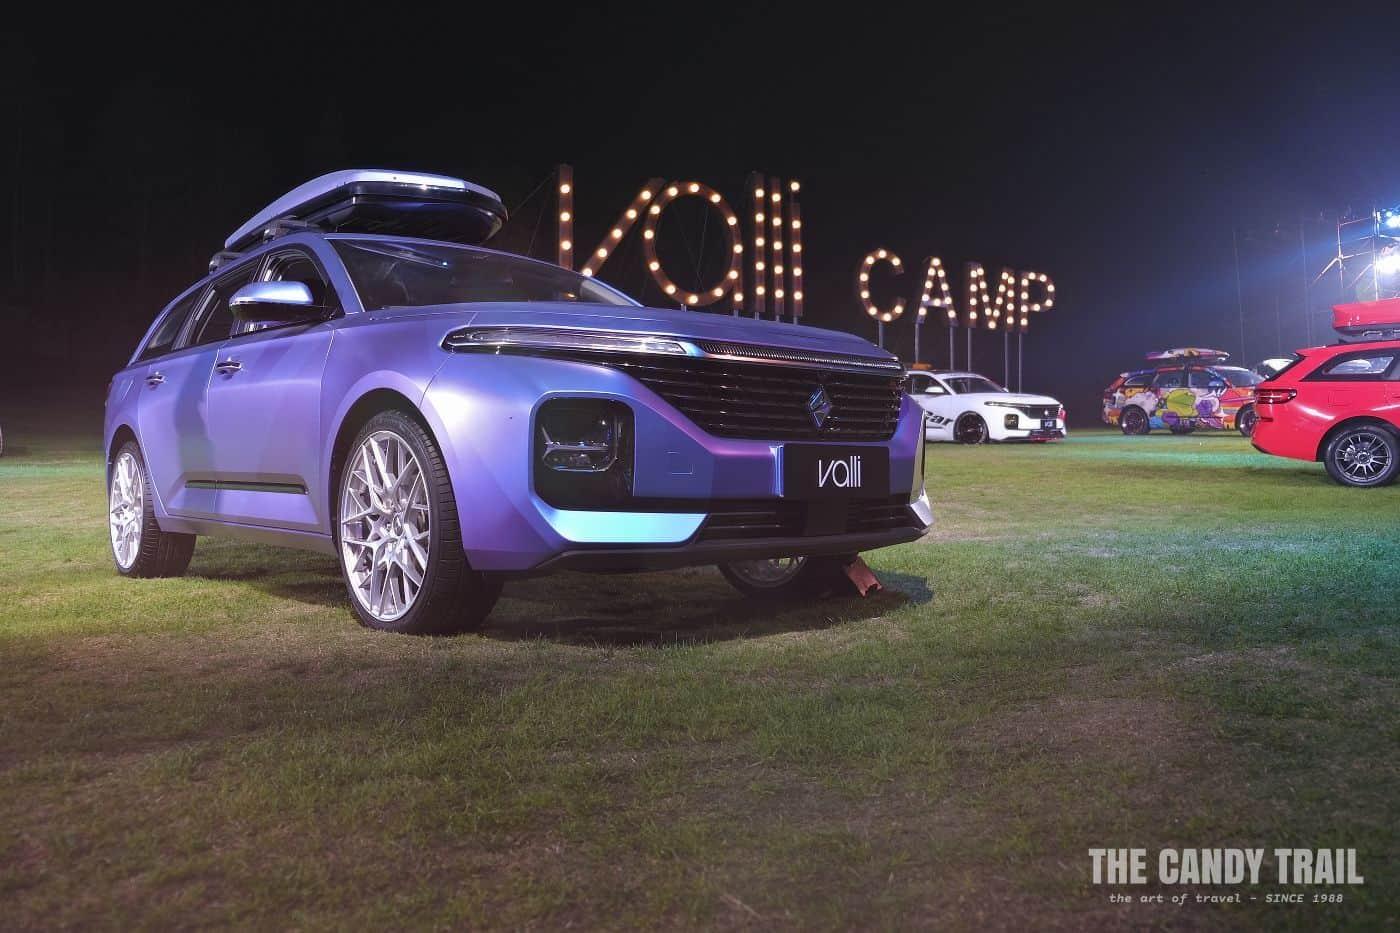 new valli car by baojun - wuling in china